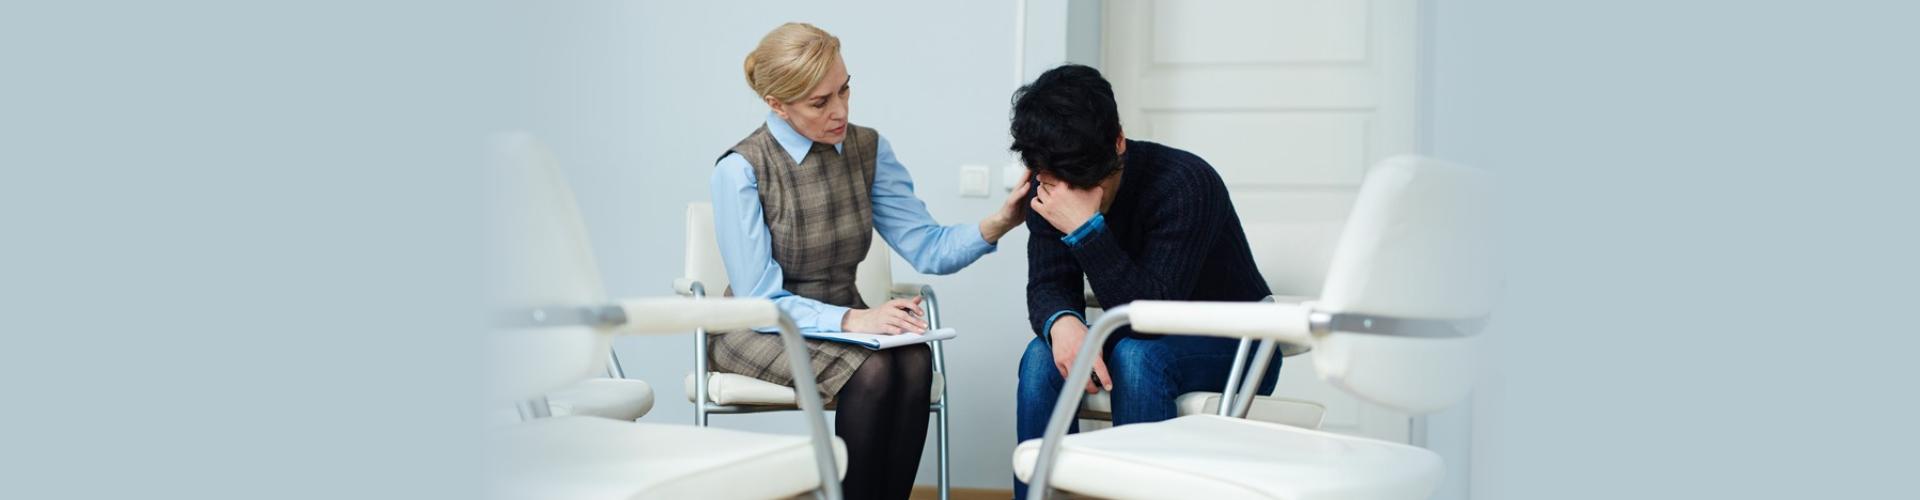 psychiatrist comforting the boy